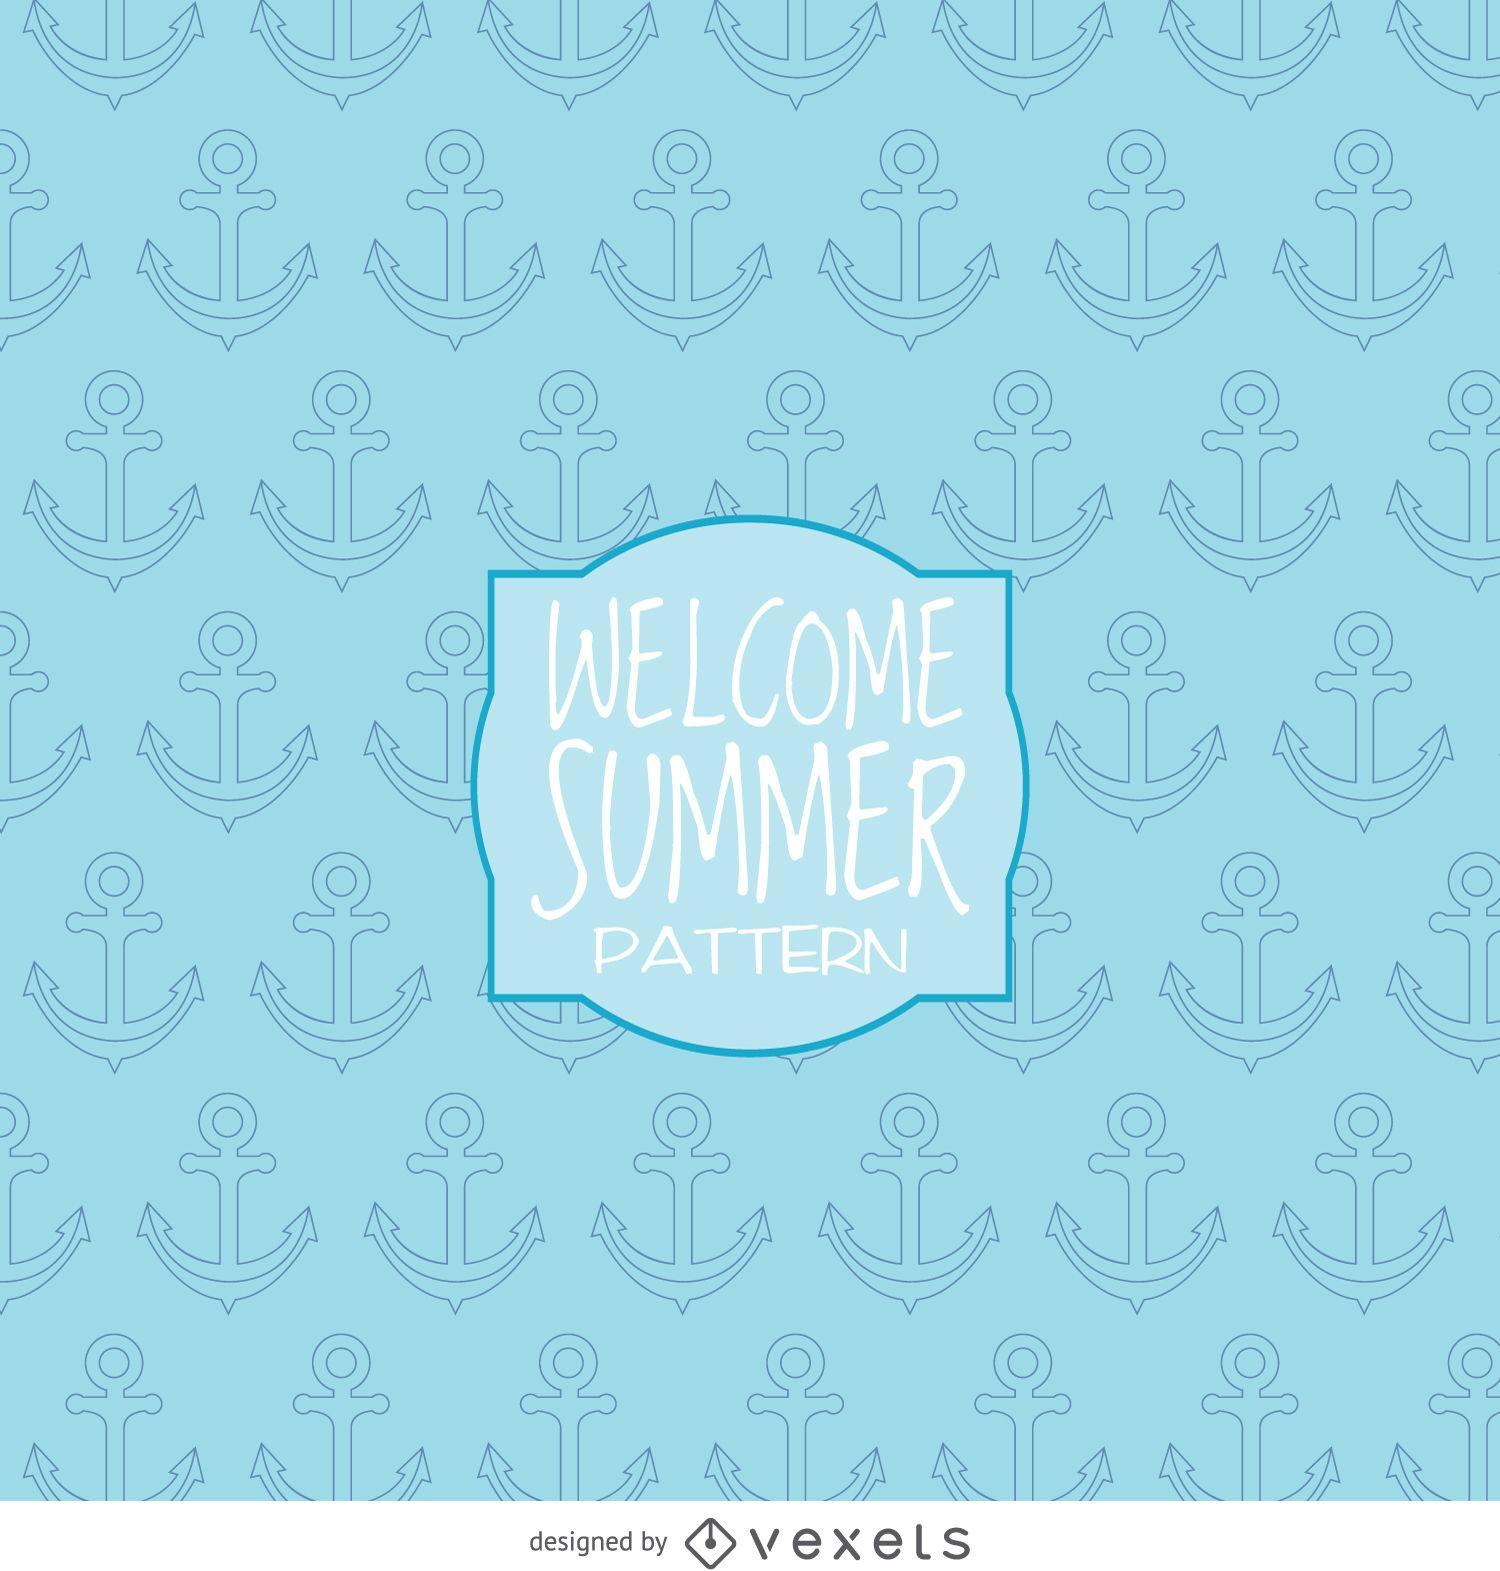 Summer anchor drawing pattern